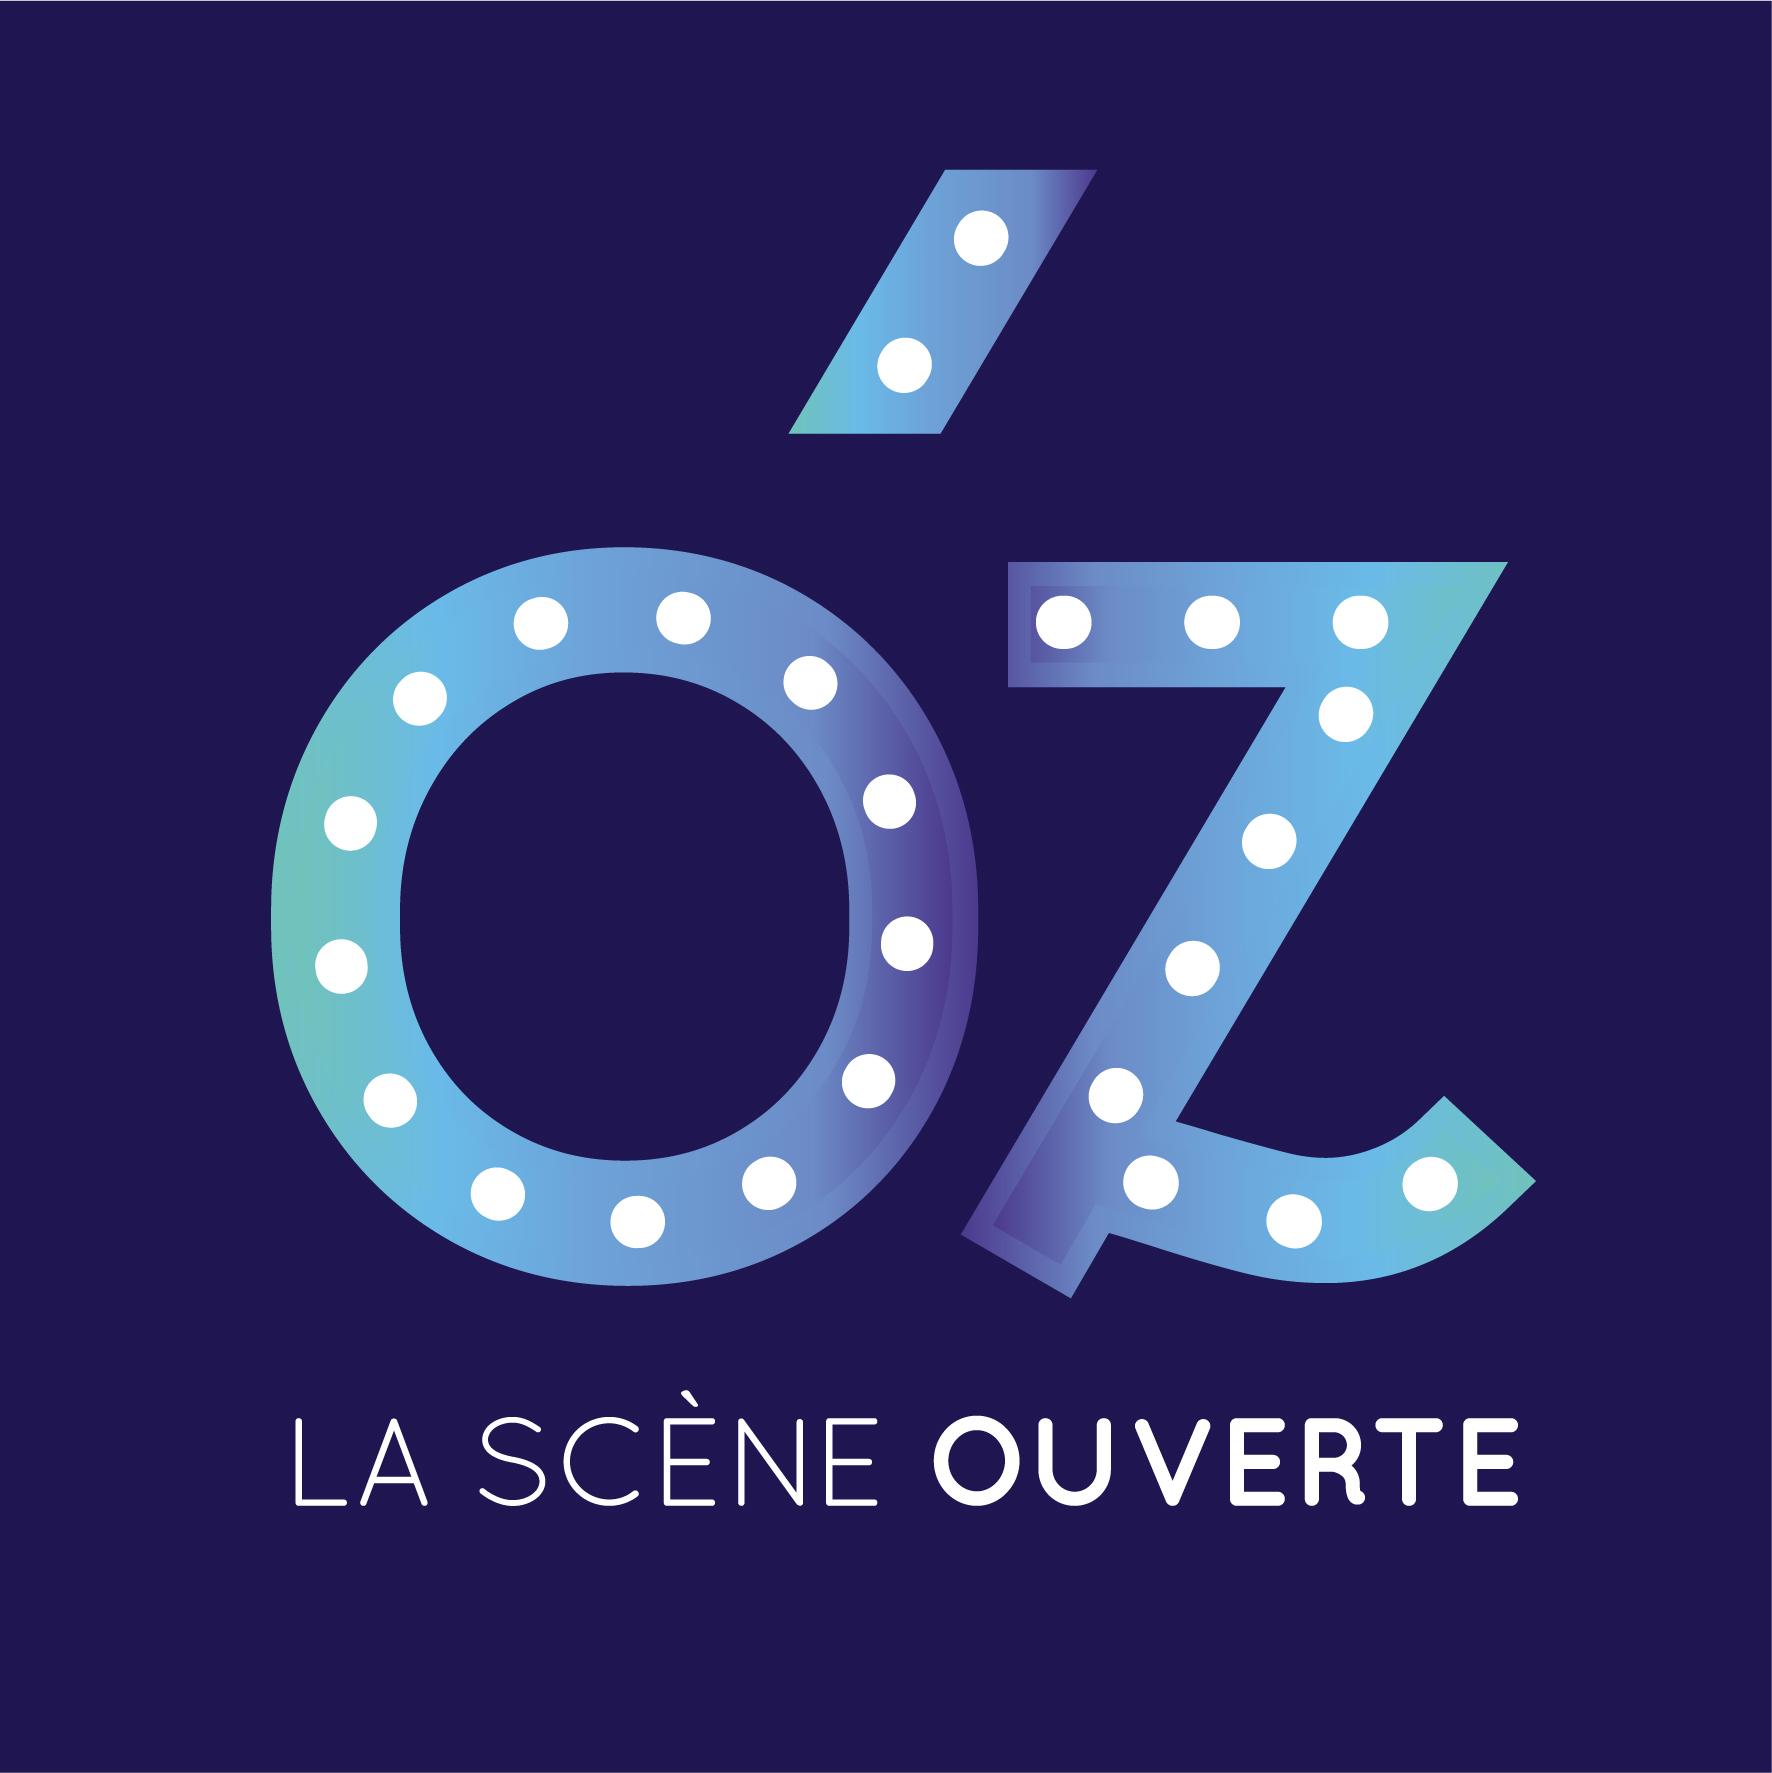 OZ! La scène ouverte